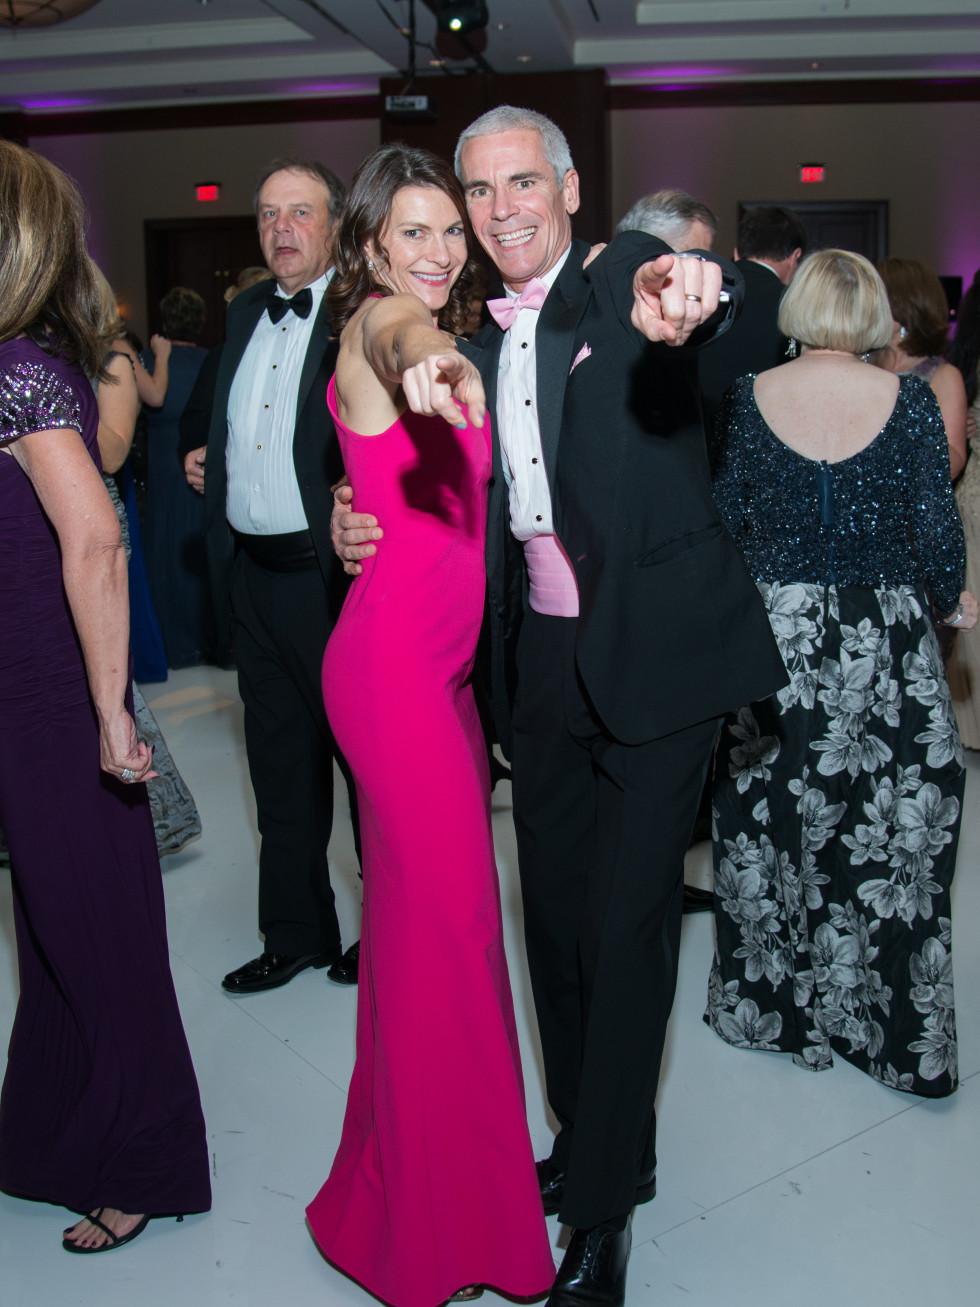 Komen Foundation Gala, Feb. 2016, Trish Hayes, Andrew Hayes